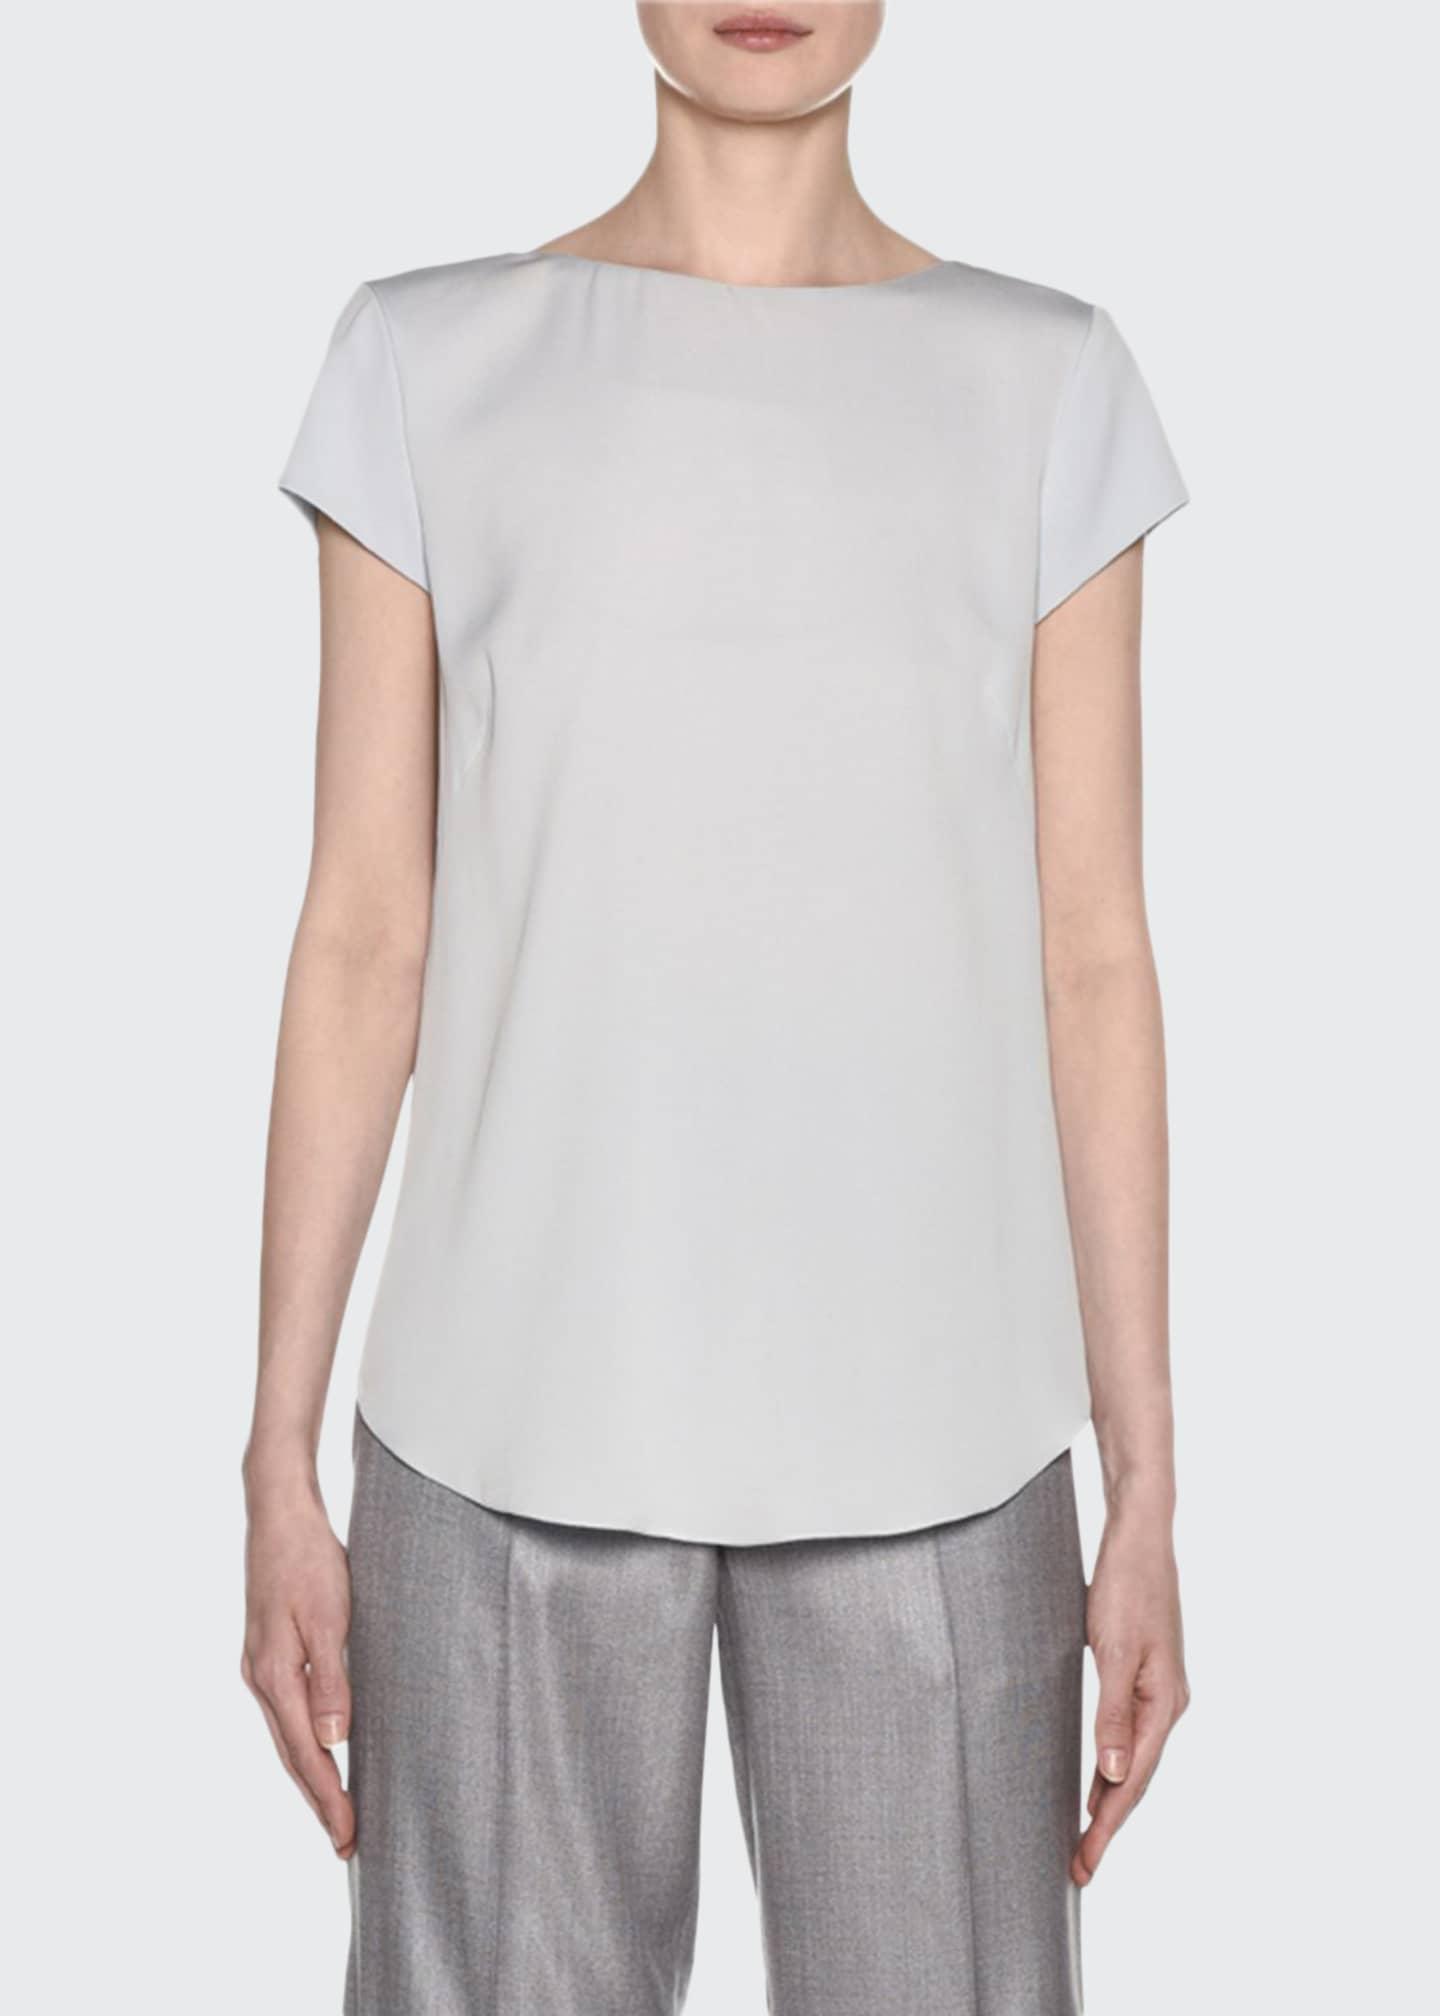 Giorgio Armani Short-Sleeve Crisscross Back Silk Blouse